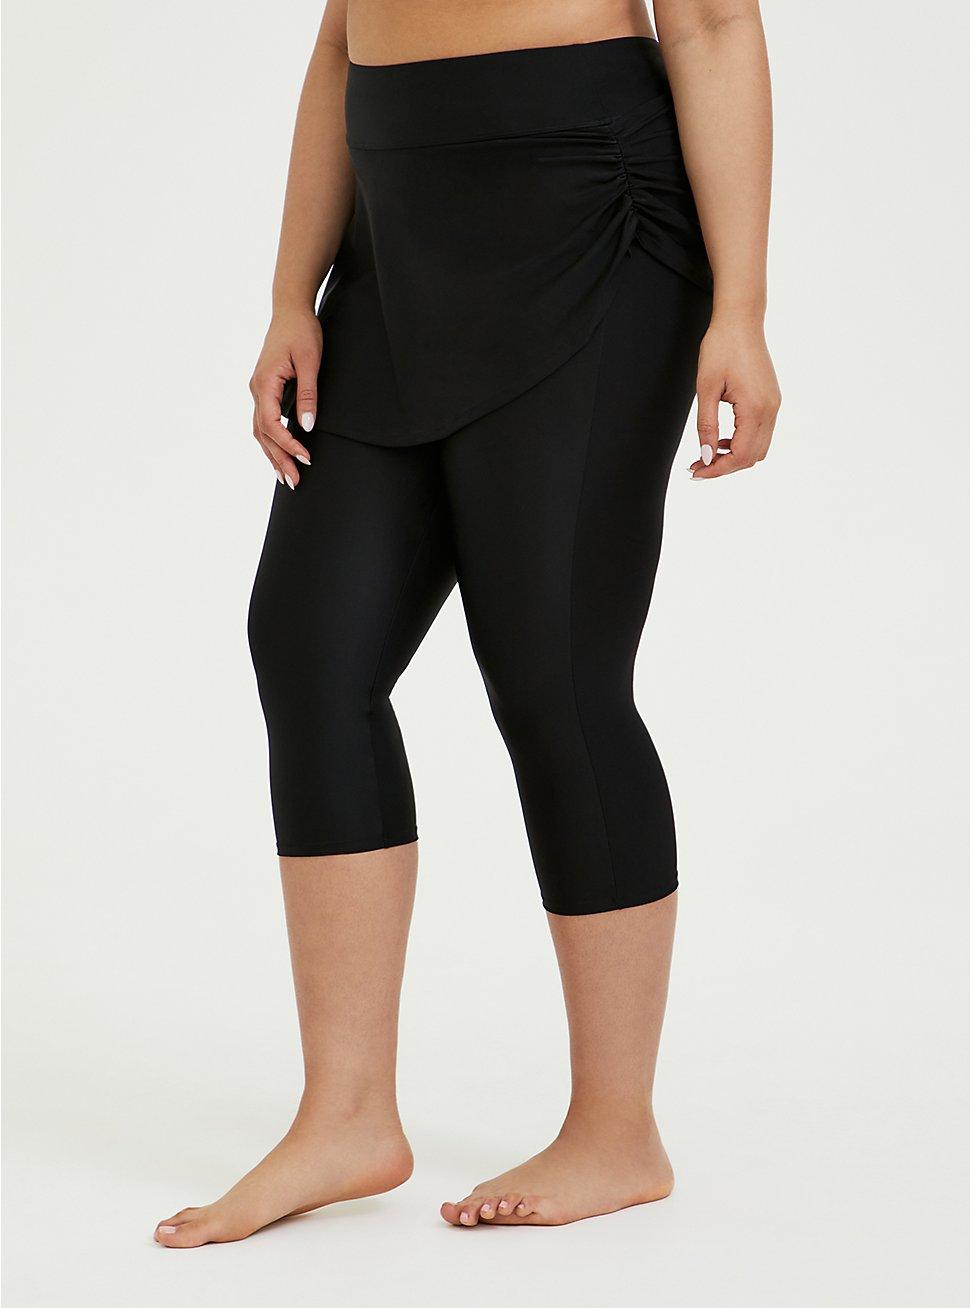 Black Ruched Skirt Overlay Capri Swim Legging, DEEP BLACK, hi-res